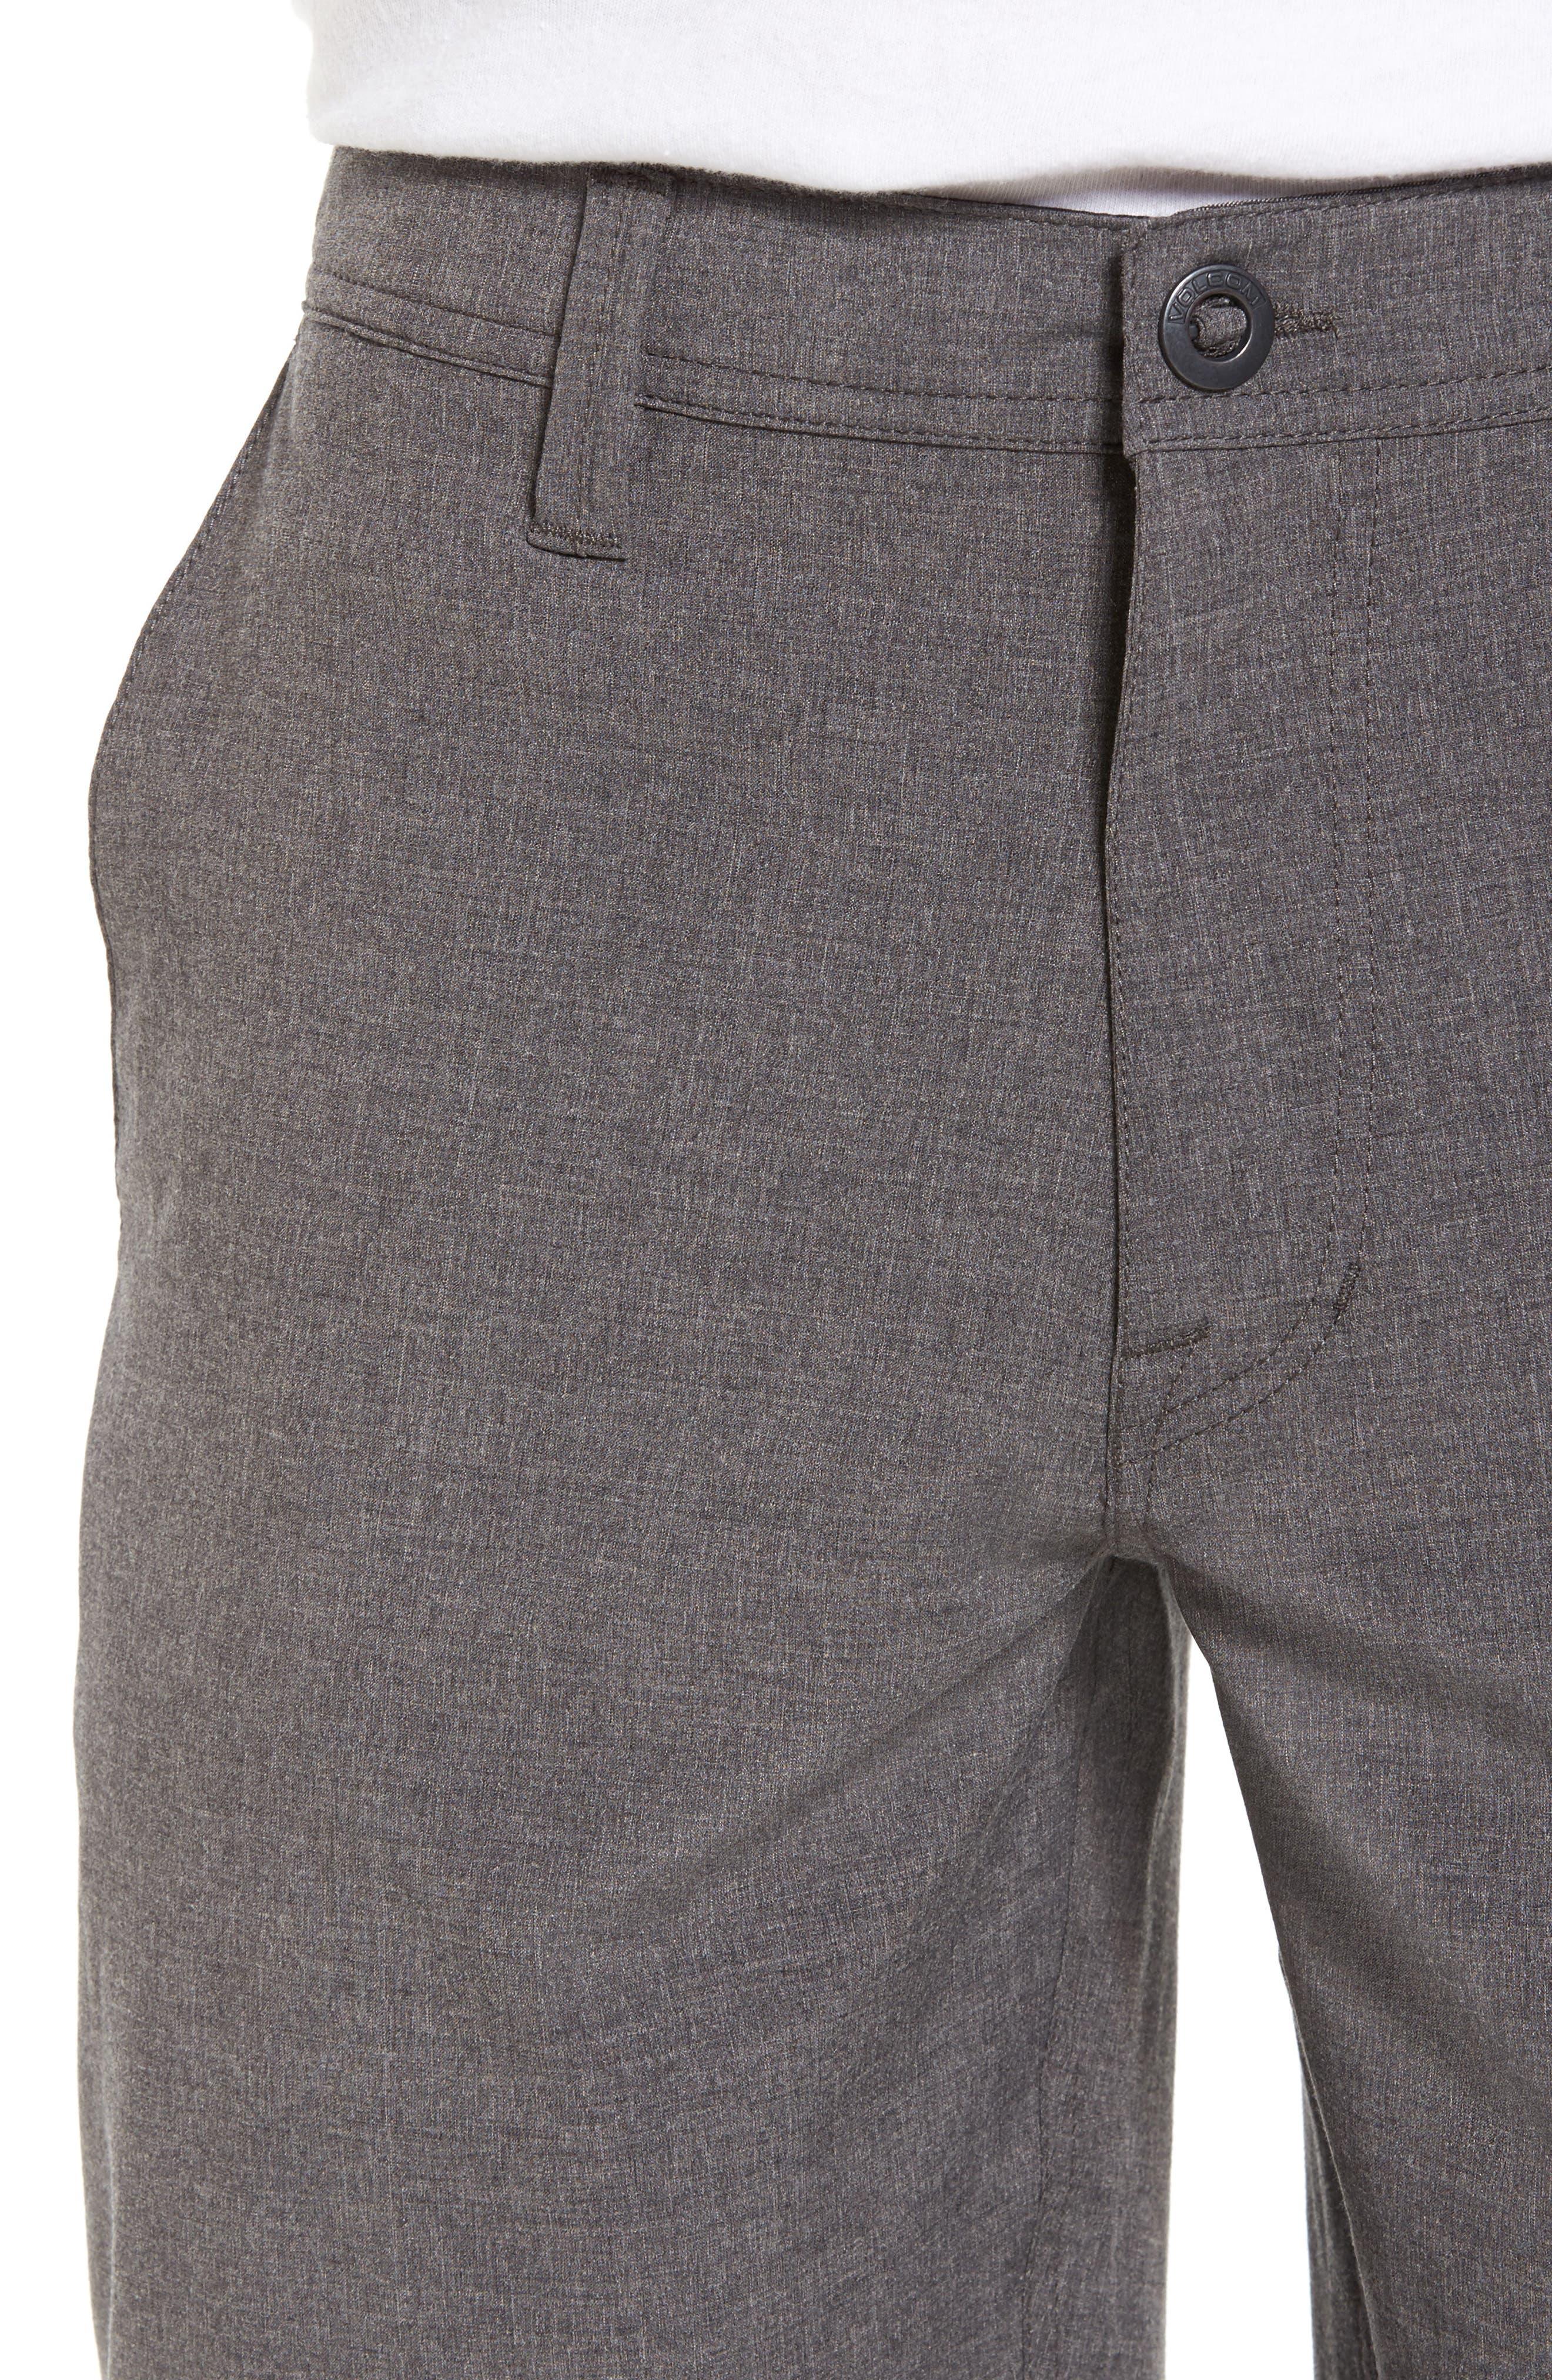 Hybrid Shorts,                             Alternate thumbnail 4, color,                             CHARCOAL